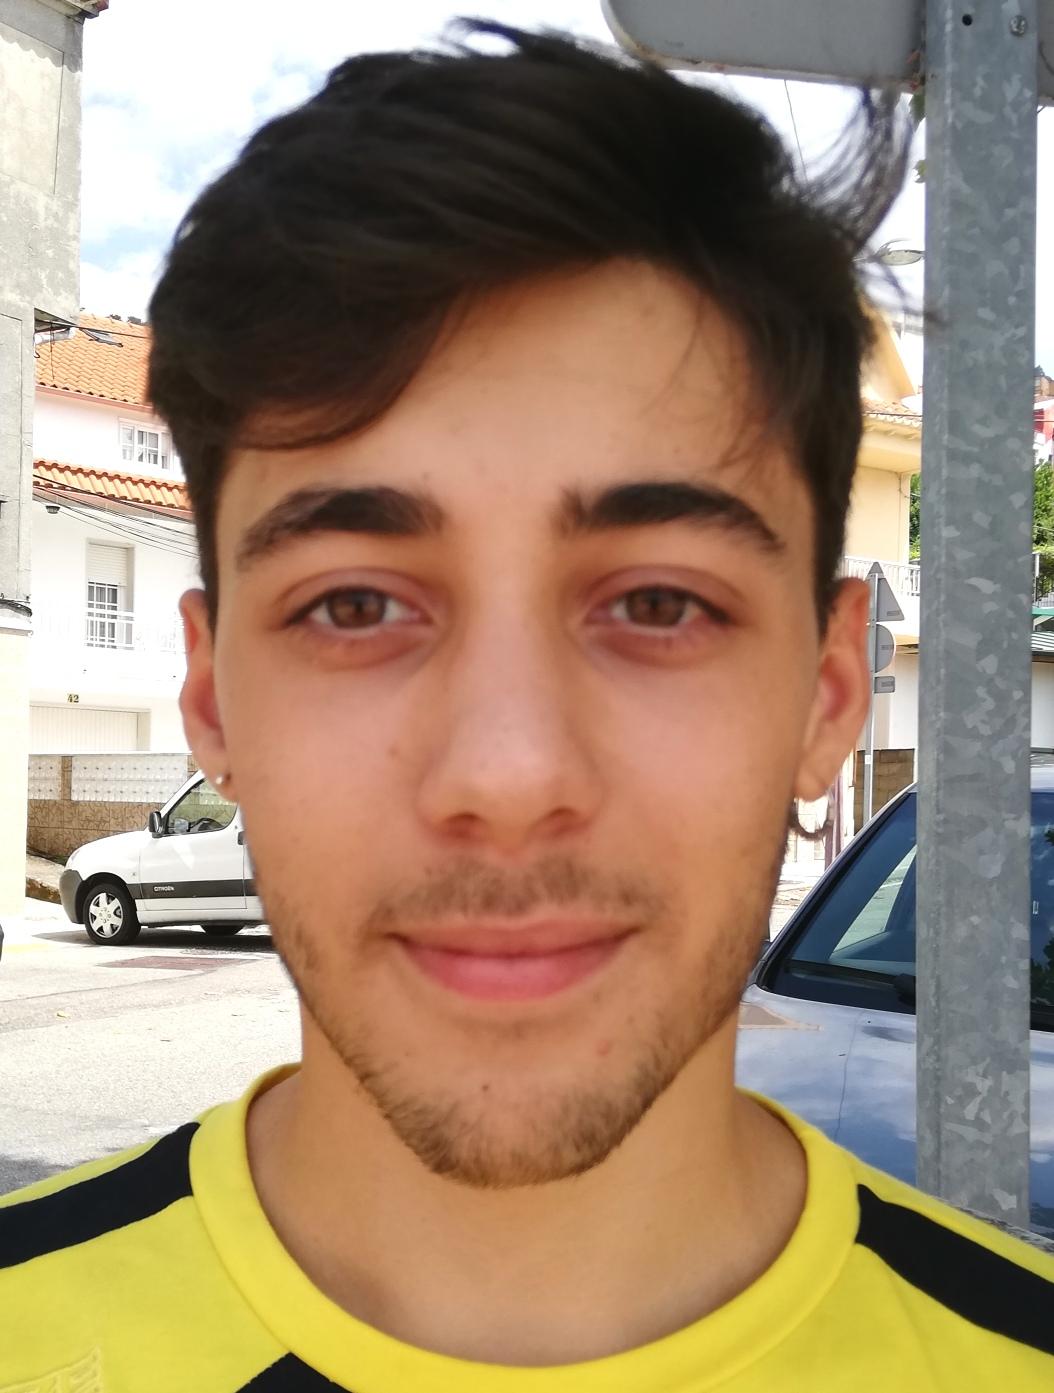 Carlos Álvarez - NON PROPIO